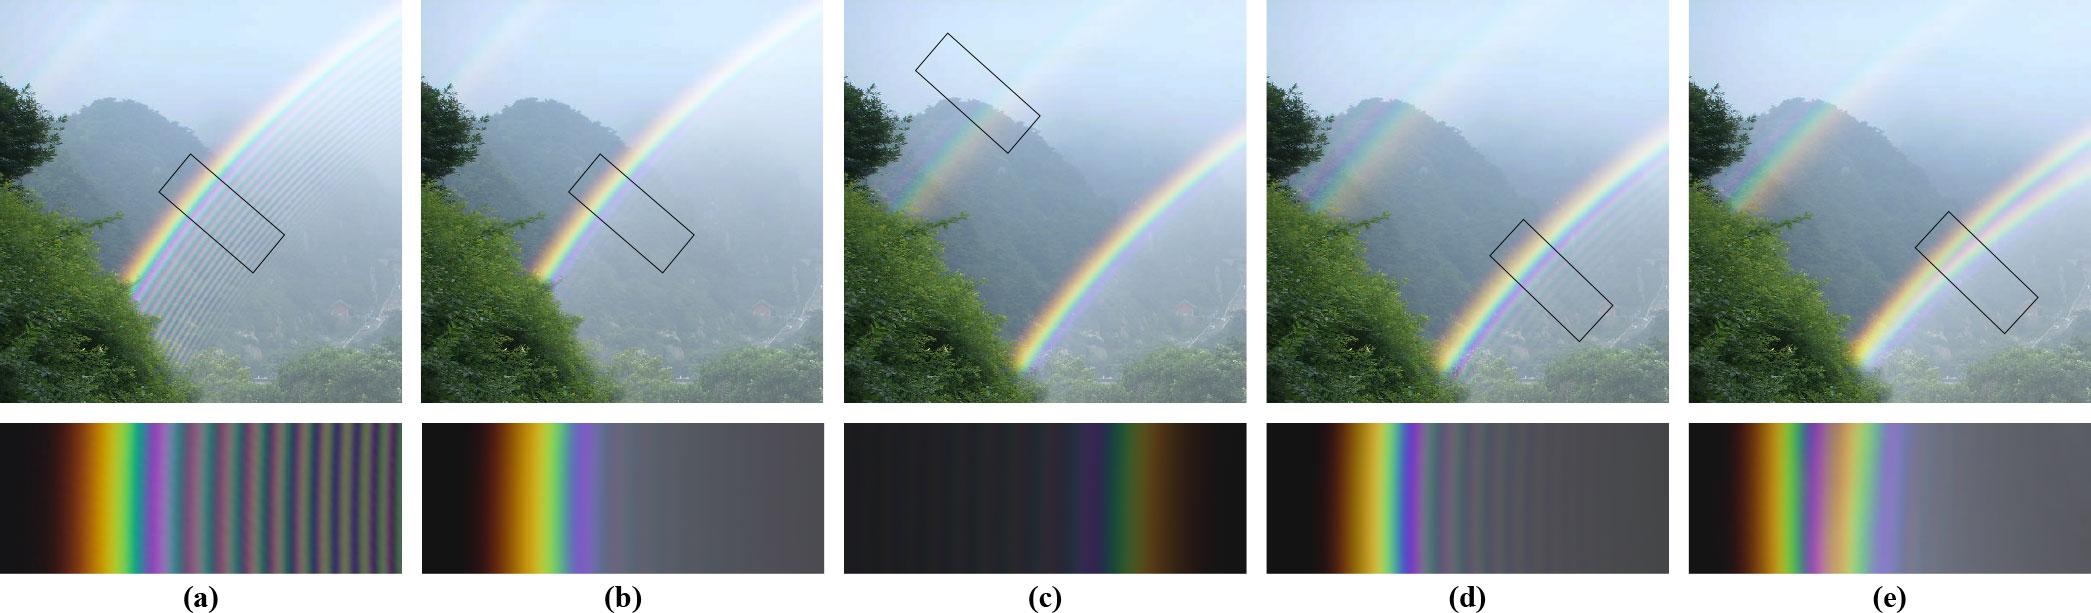 physically based simulation of rainbows